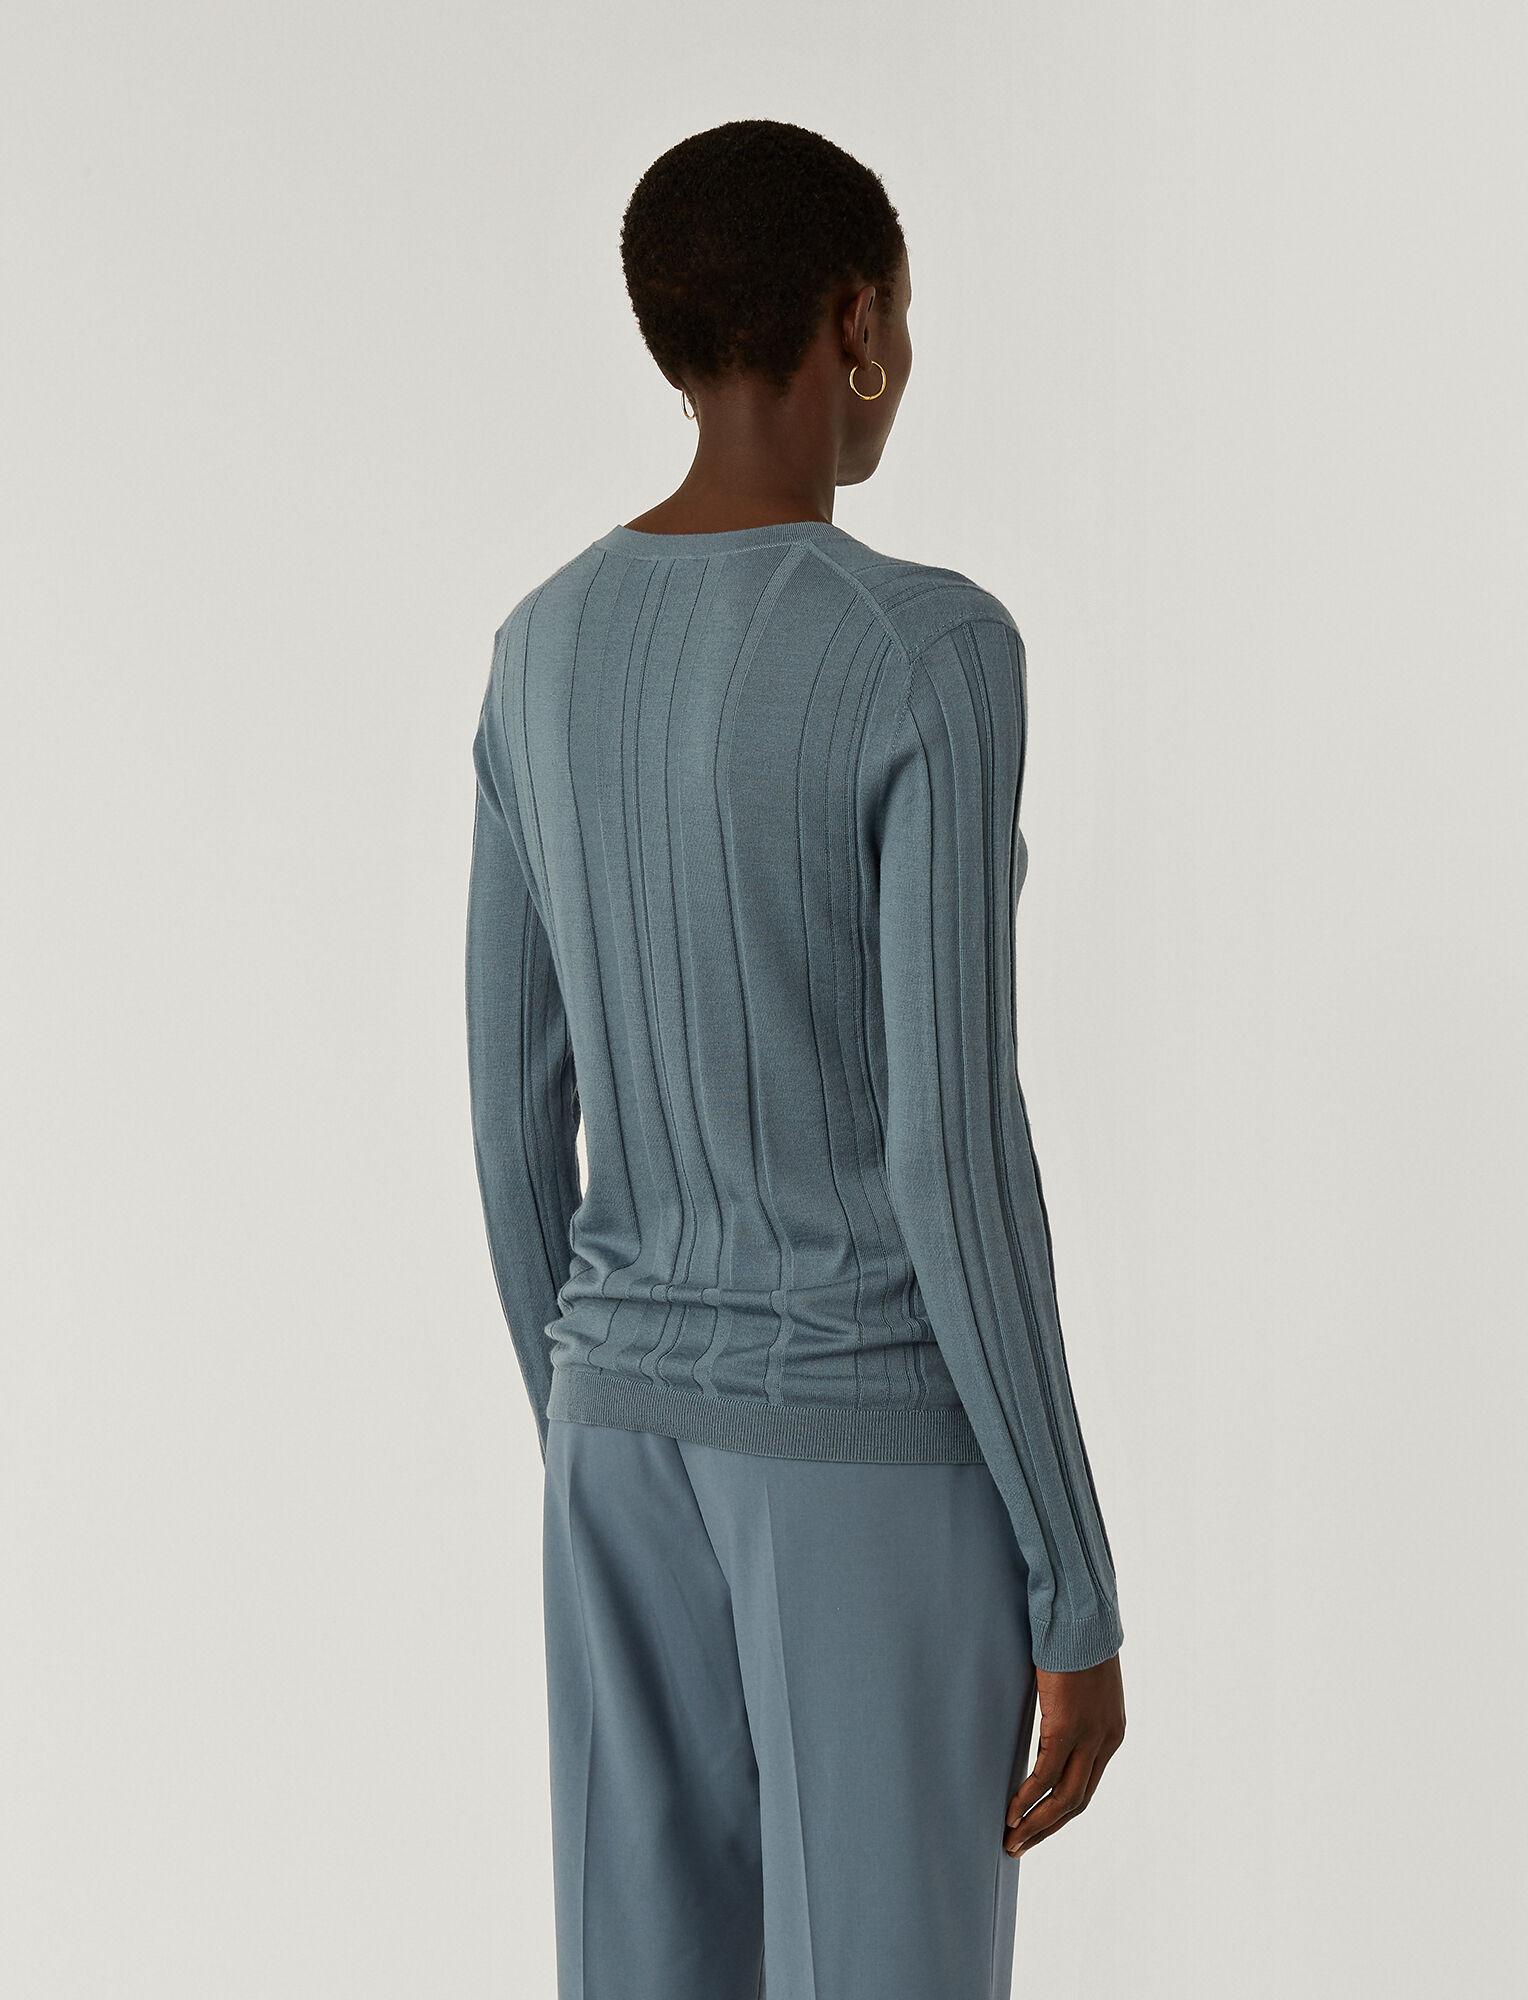 Joseph, Pull en laine mérinos fine à col en V, in BLUE STEEL